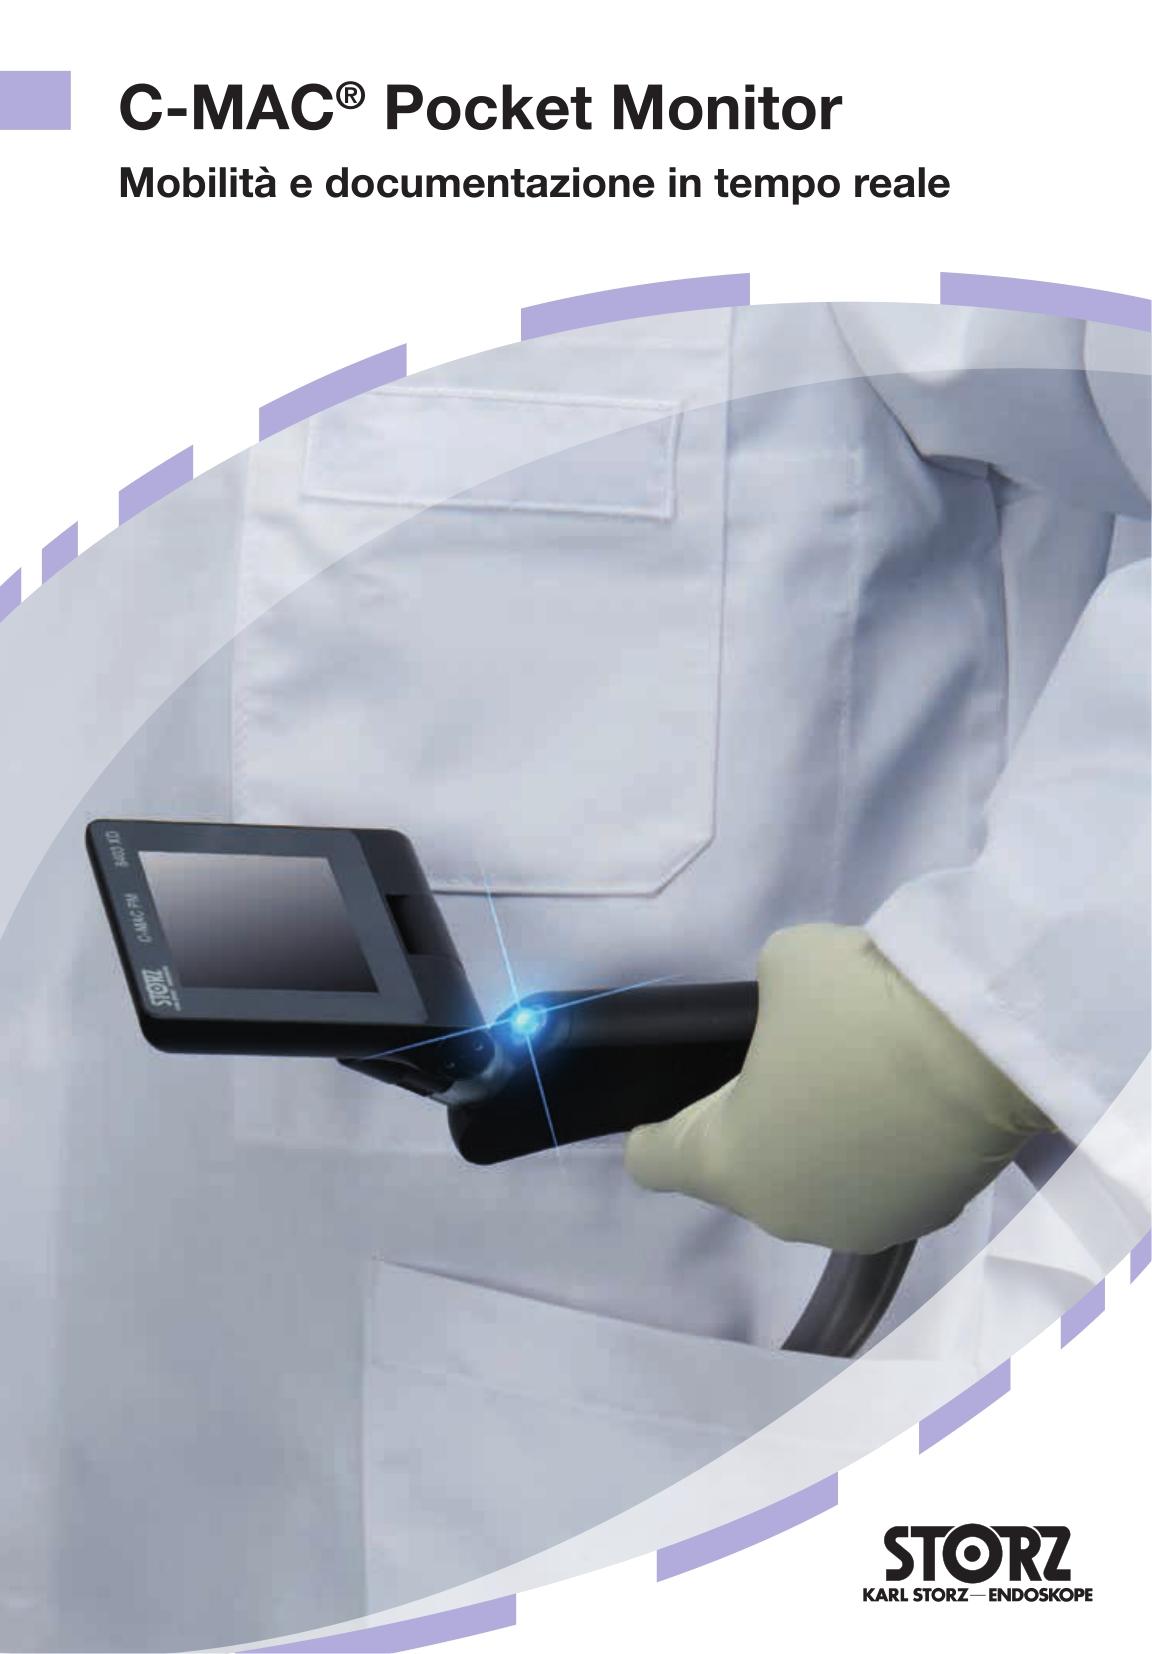 Anestesia e medicina d'emergenza - Videolaringoscopio portatile C-MAC® Pocket Monitor